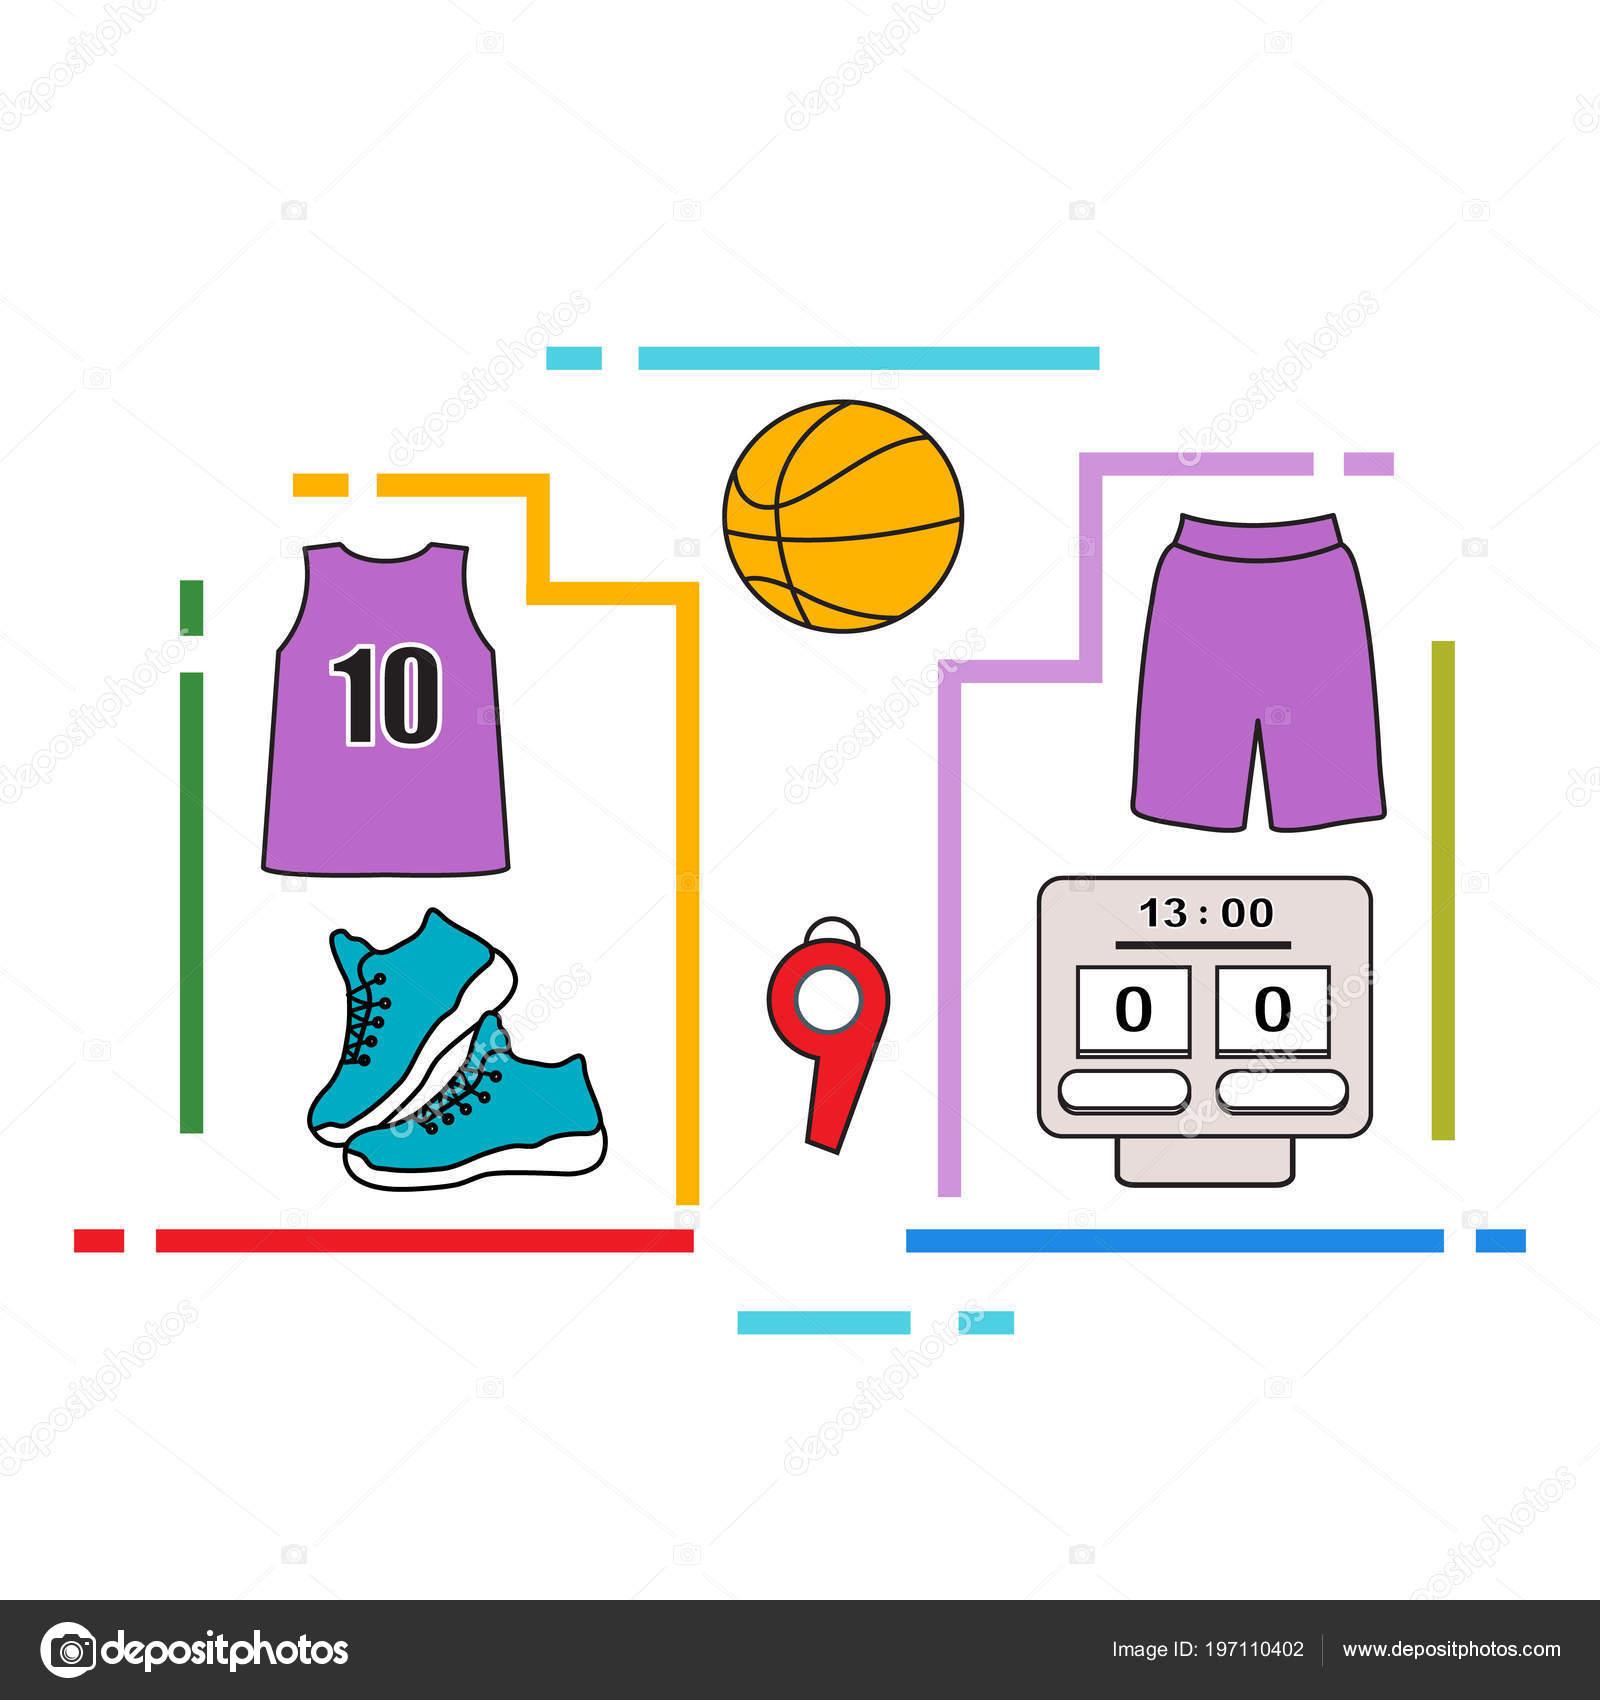 Camisa Baloncesto Deportes Marcador Pantalones Uniformes Equipos 7wF1qY0O